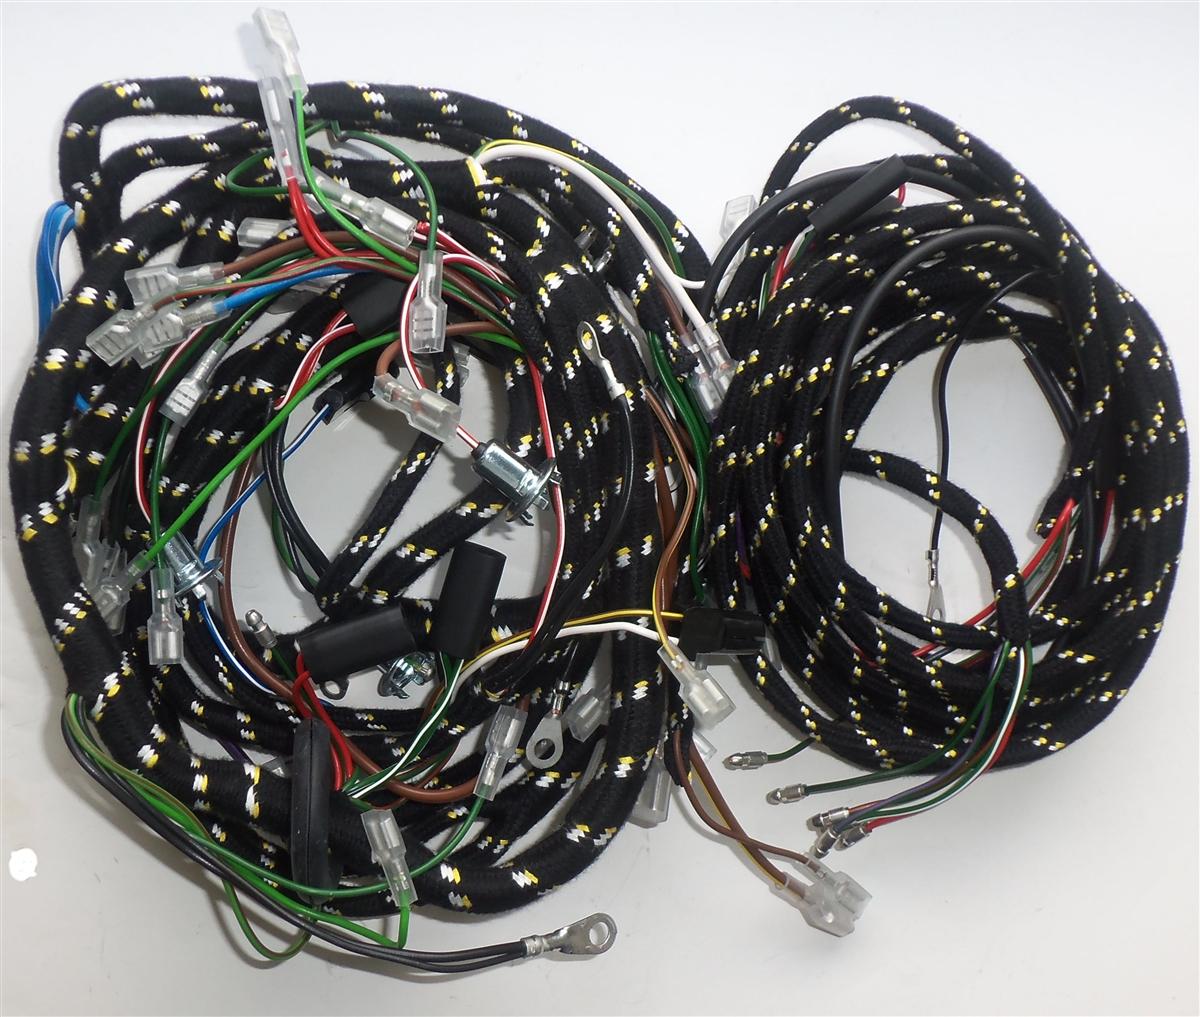 Main and Wiring Harness (PB)